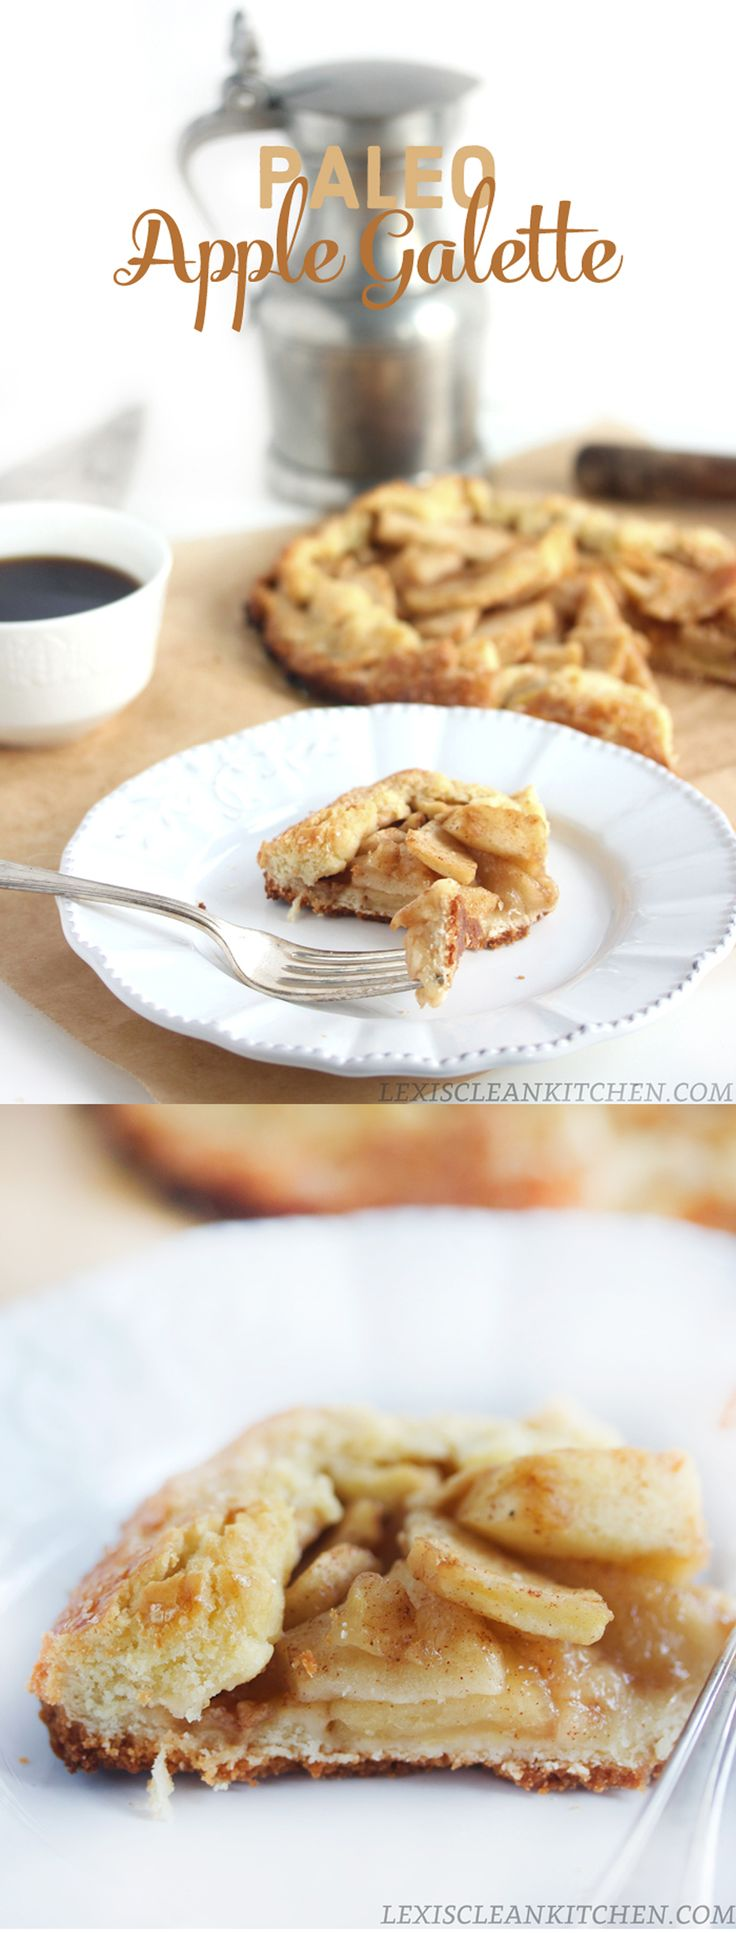 The Best Paleo Apple Galette #paleo #glutenfree